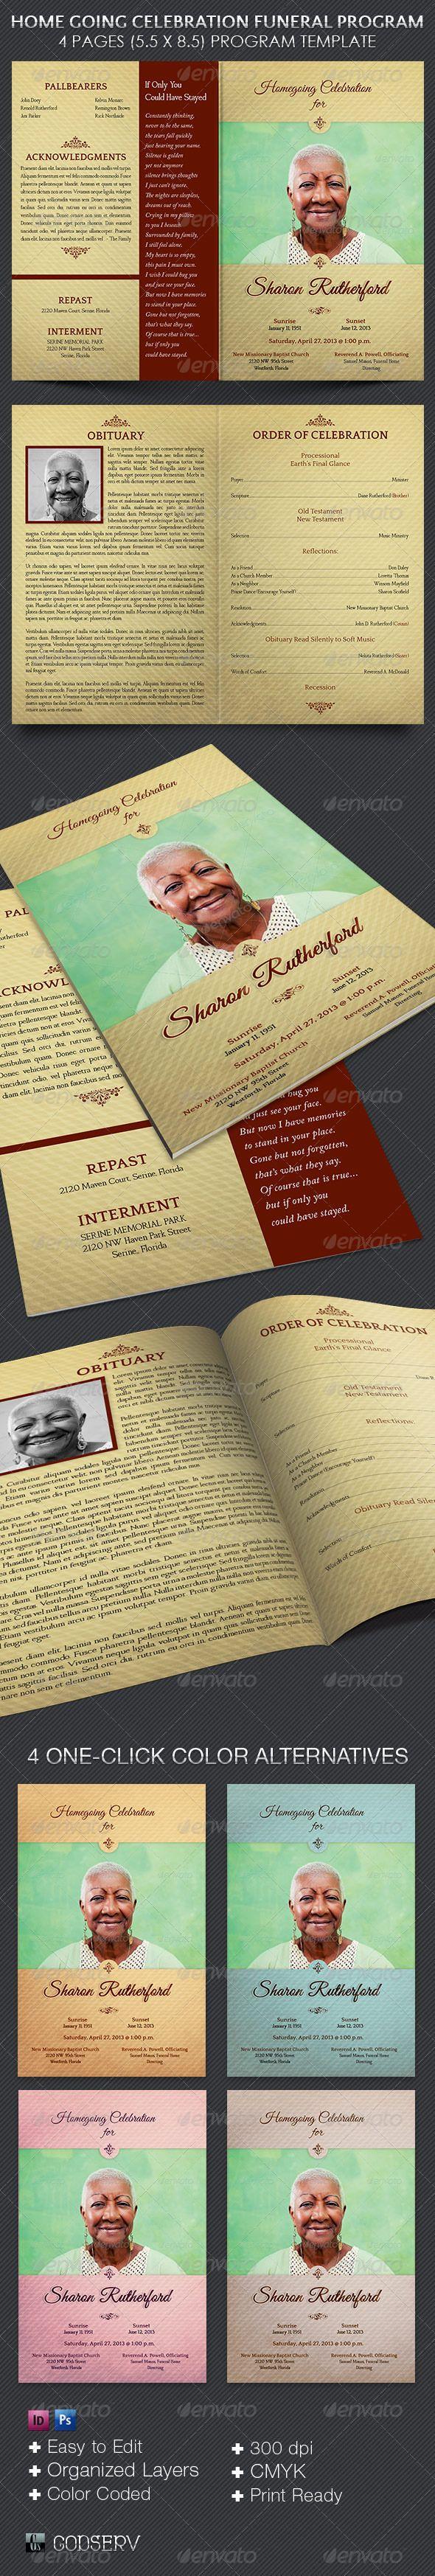 Home Going Funeral Program Template - Informational Brochures